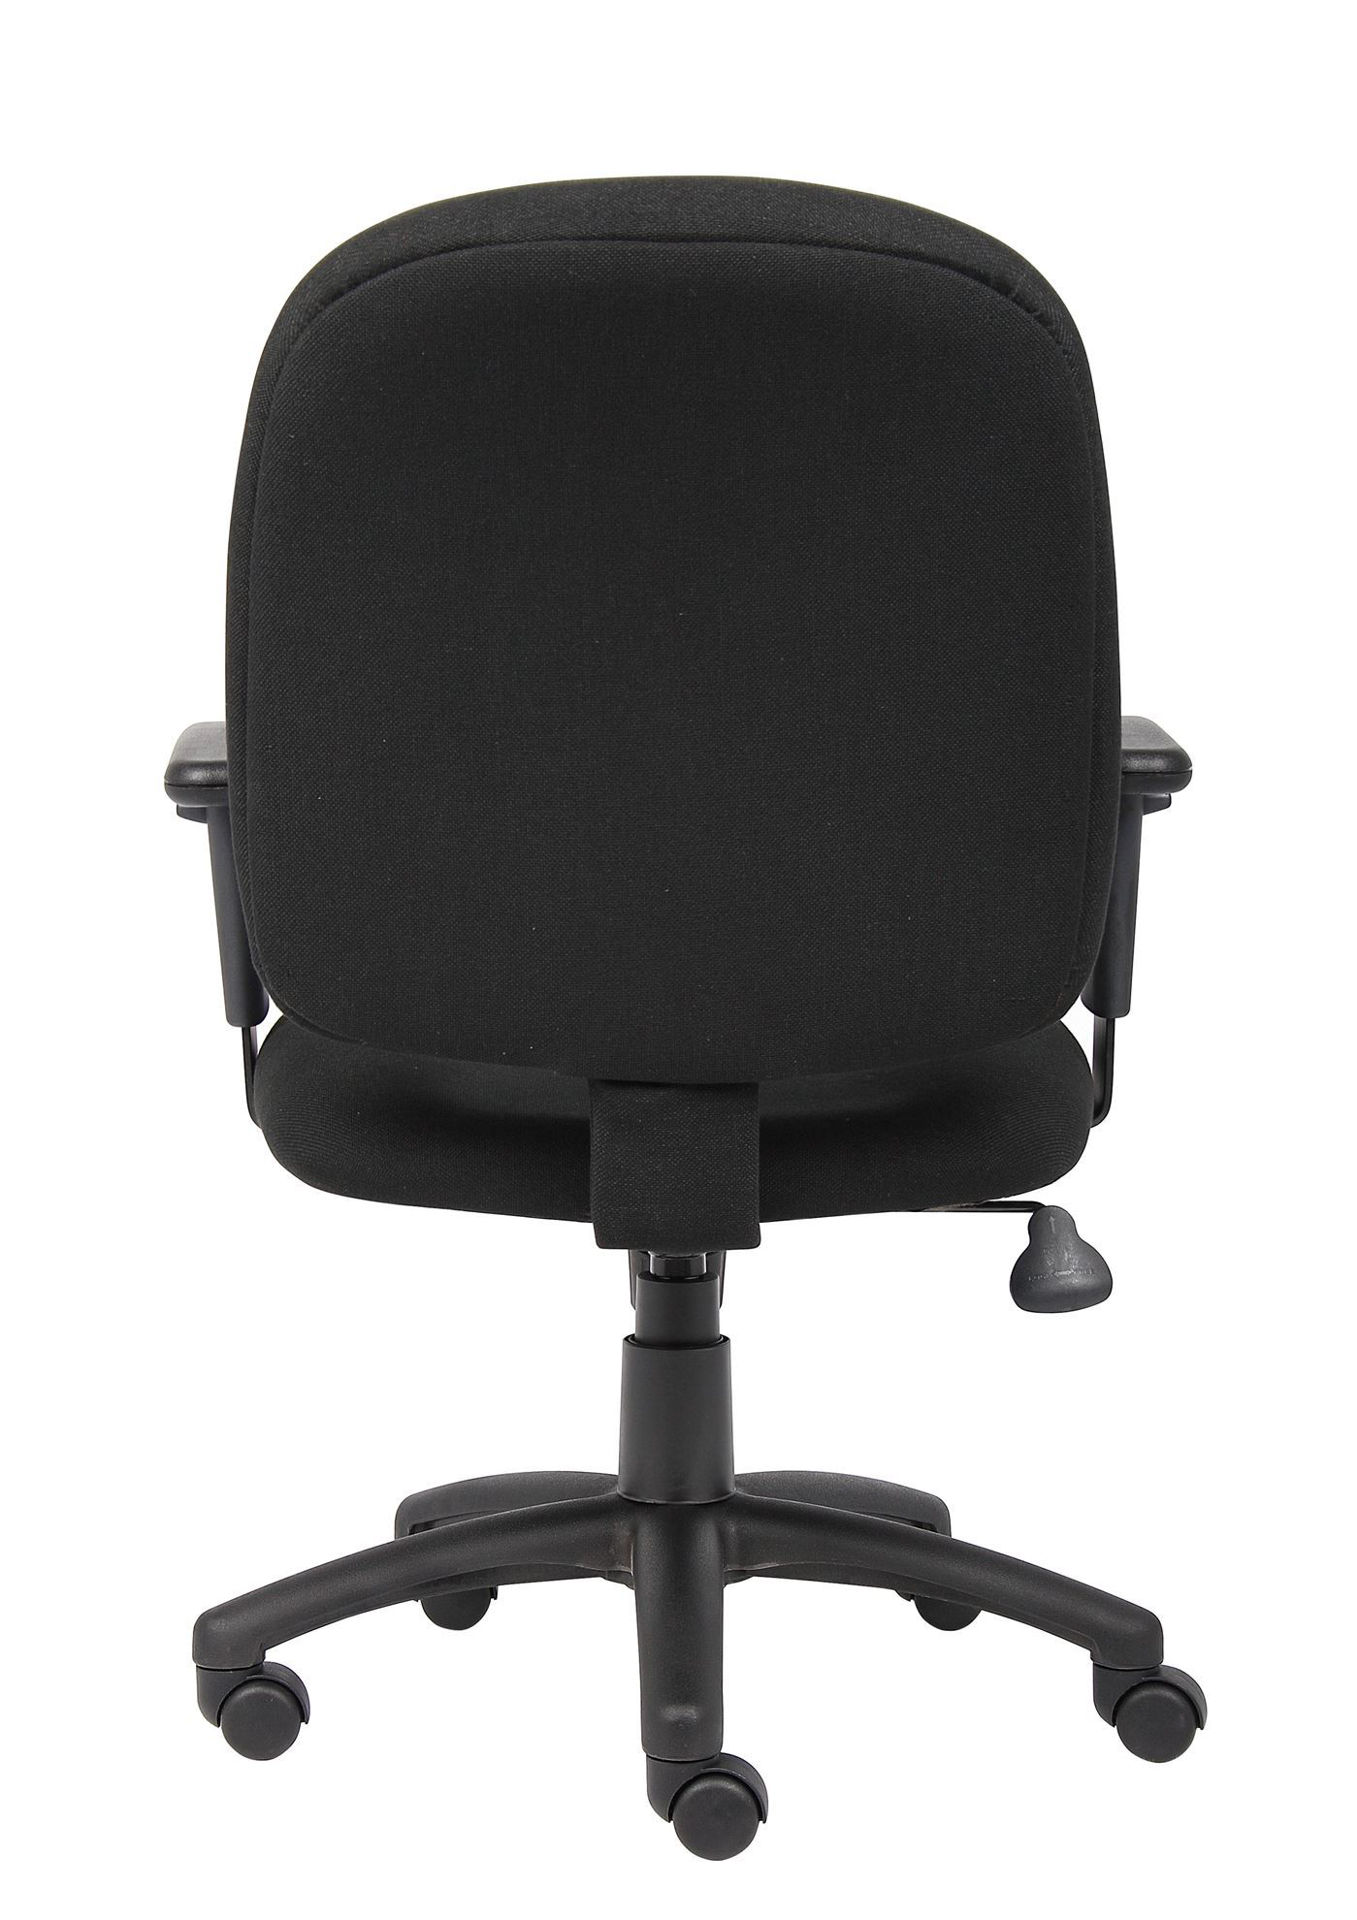 Boss Ergonomic Task Chair w/Arms - Bk